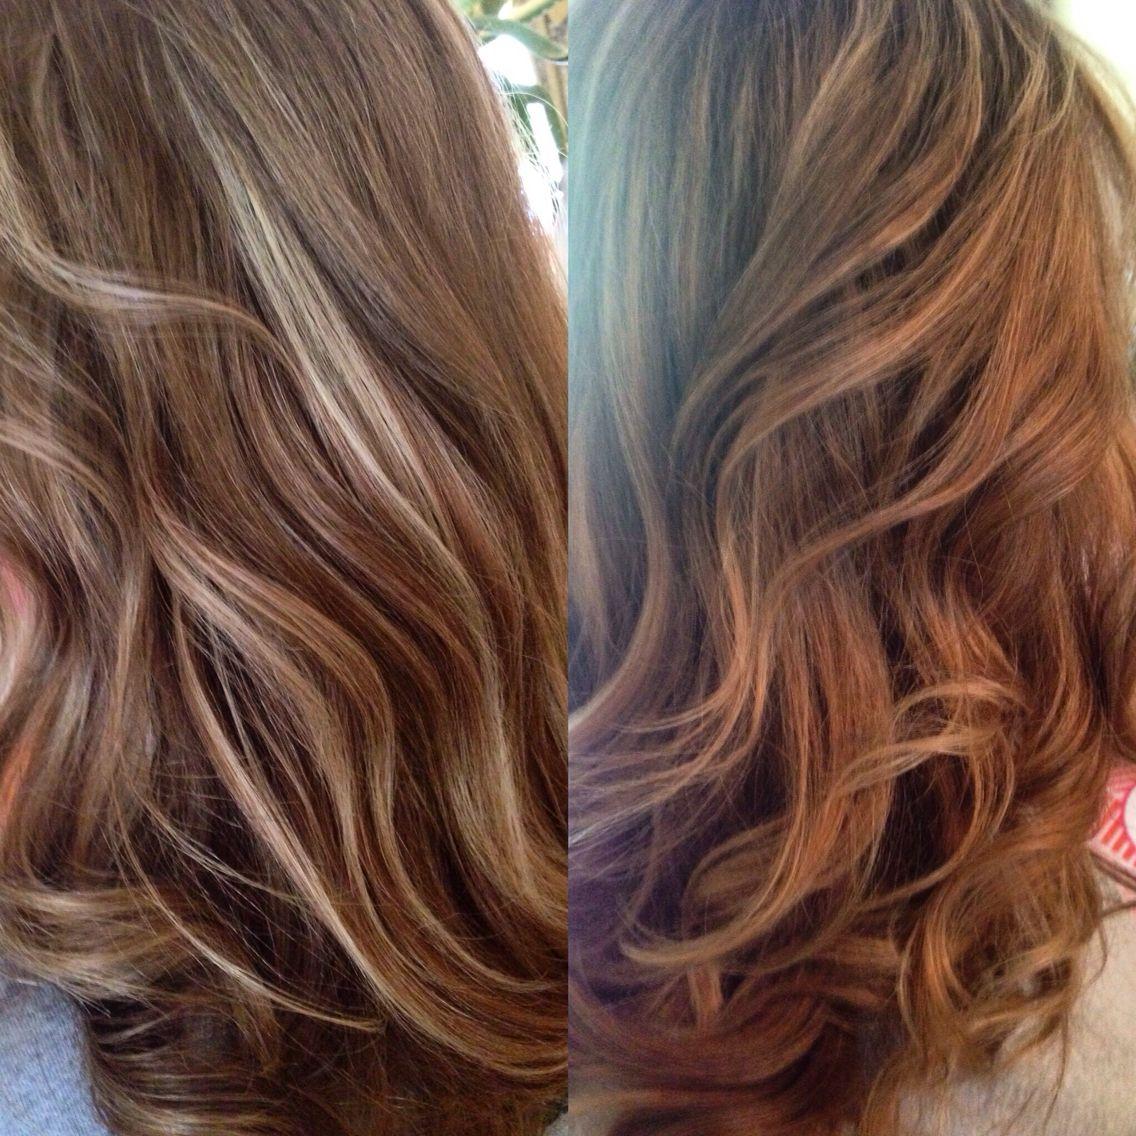 Dimensional color hair by Kayla Adams Long hair styles